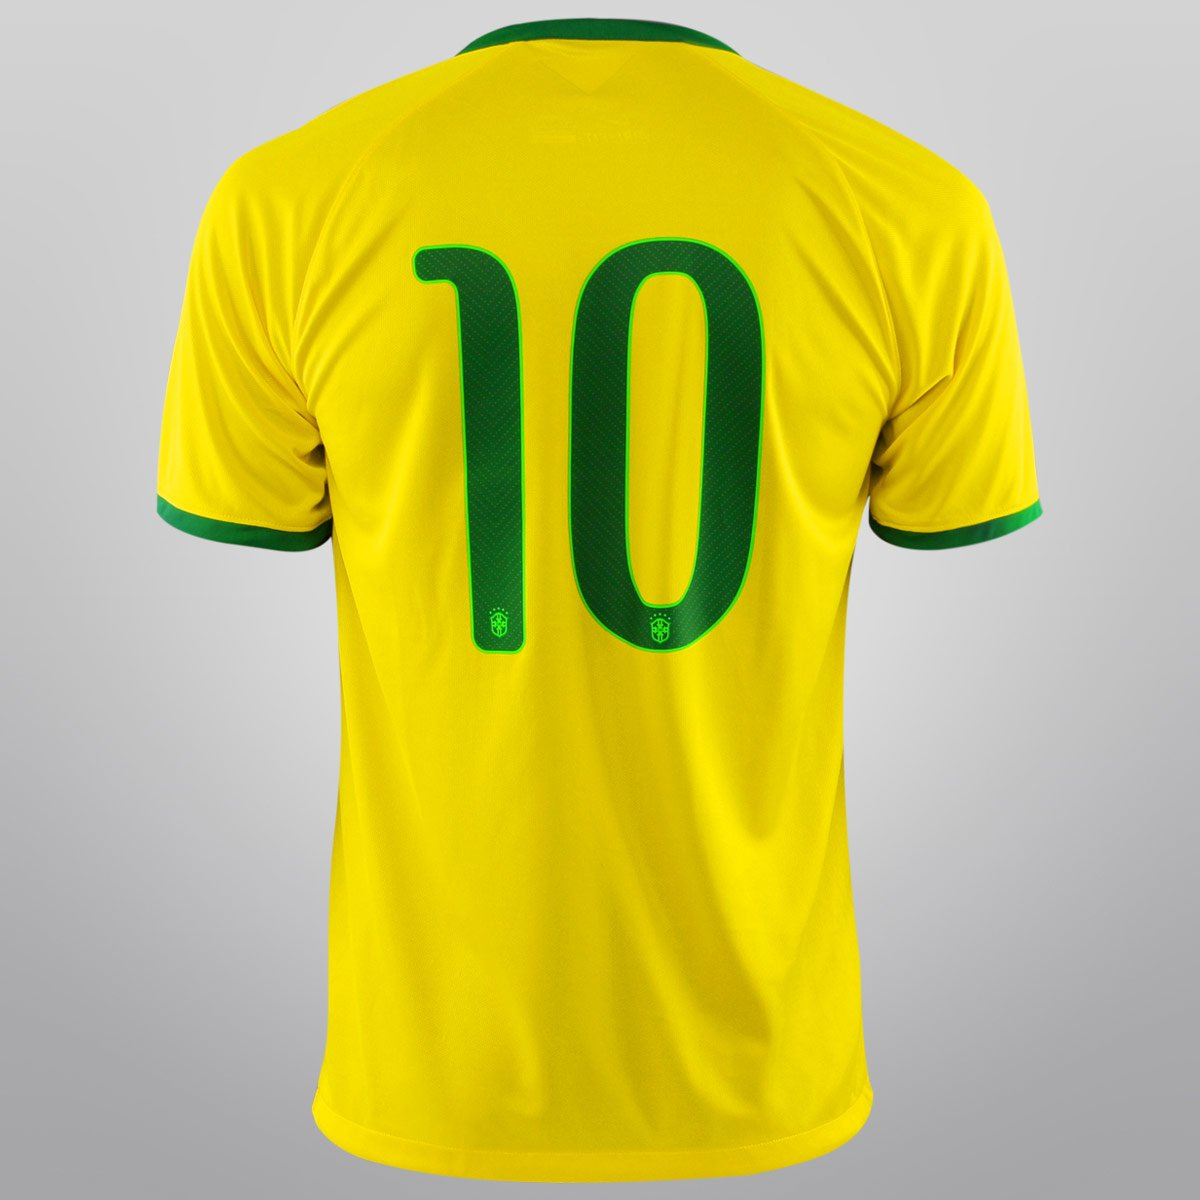 Camisa Seleção Brasil I 14 15 nº 10 - Torcedor Nike Masculina ... 3e656230aae5d